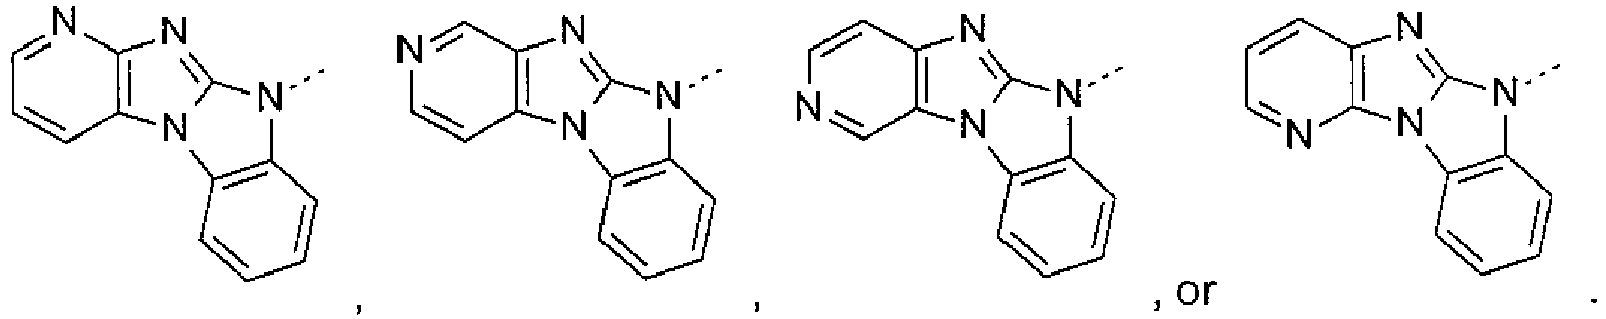 Figure imgb0750